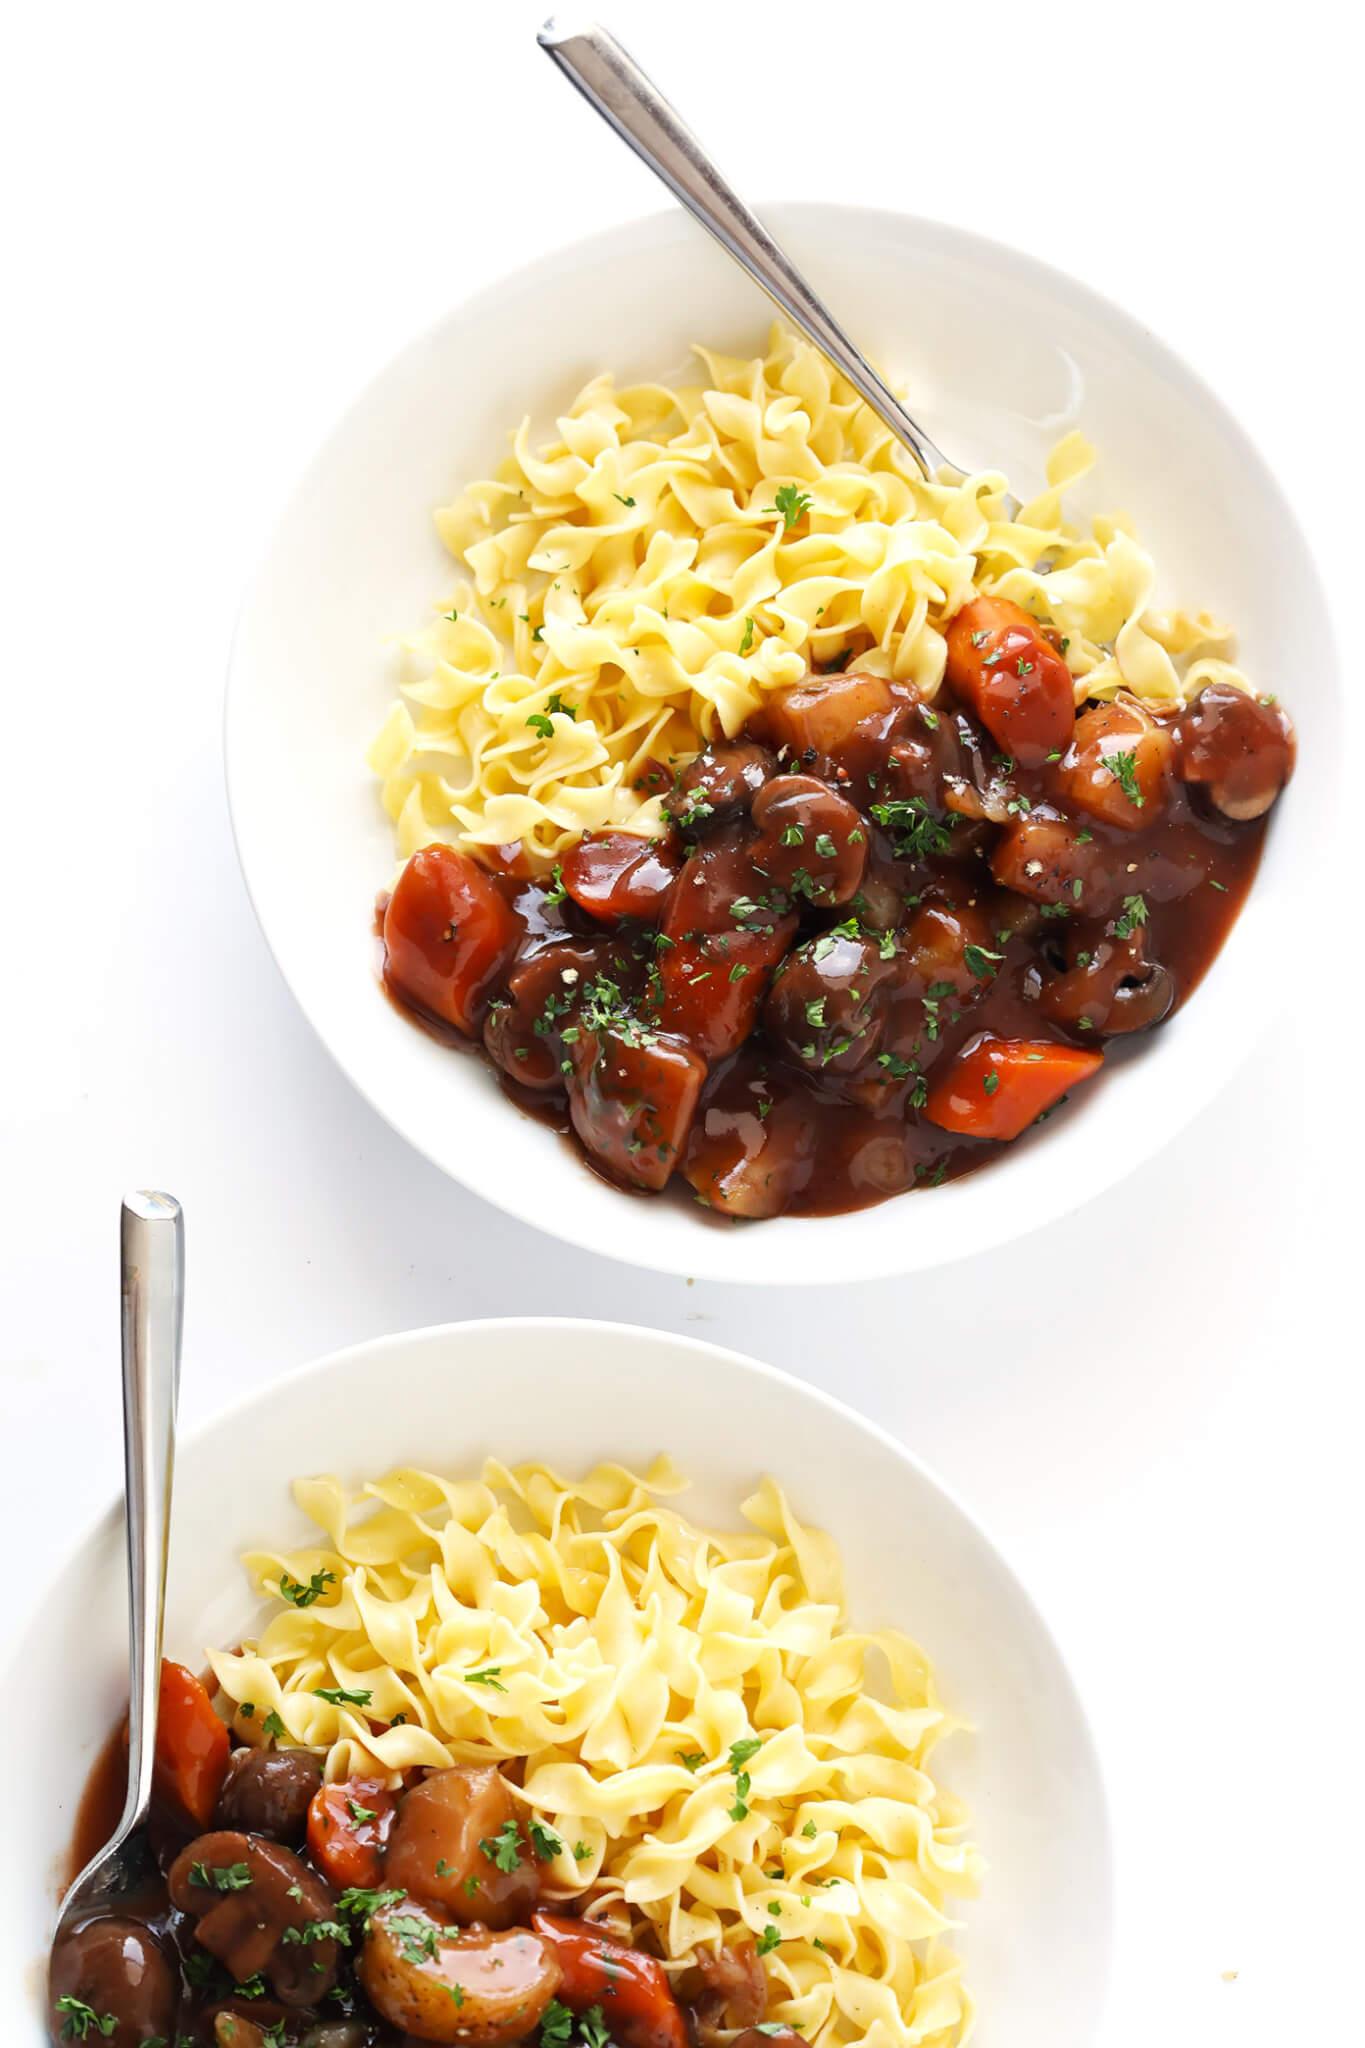 Vegetarian Mushroom Portobello Pot Roast Recipe 4 Vegetarian Portobello Pot Roast